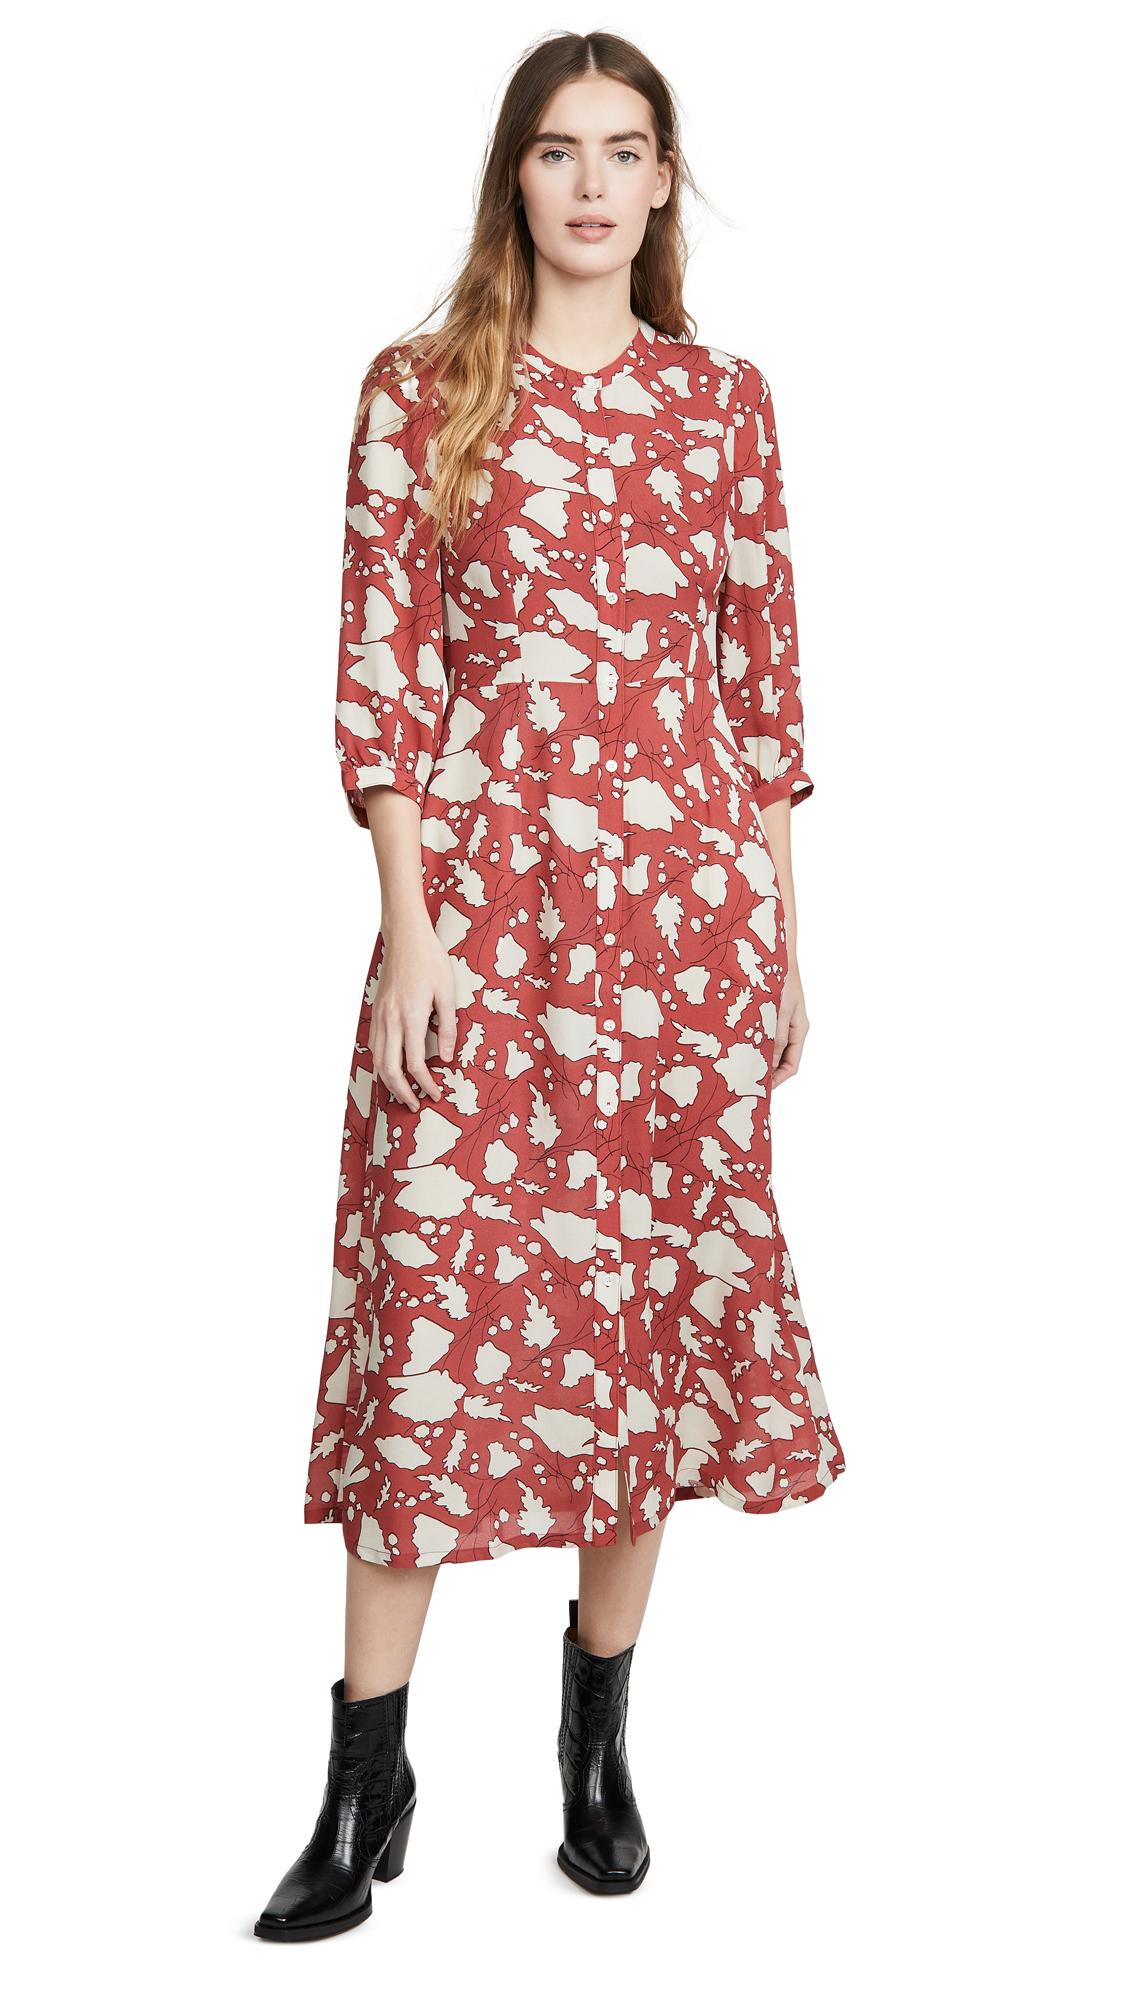 Raquel Allegra Ruffle Dreamer Dress - 50% Off Sale